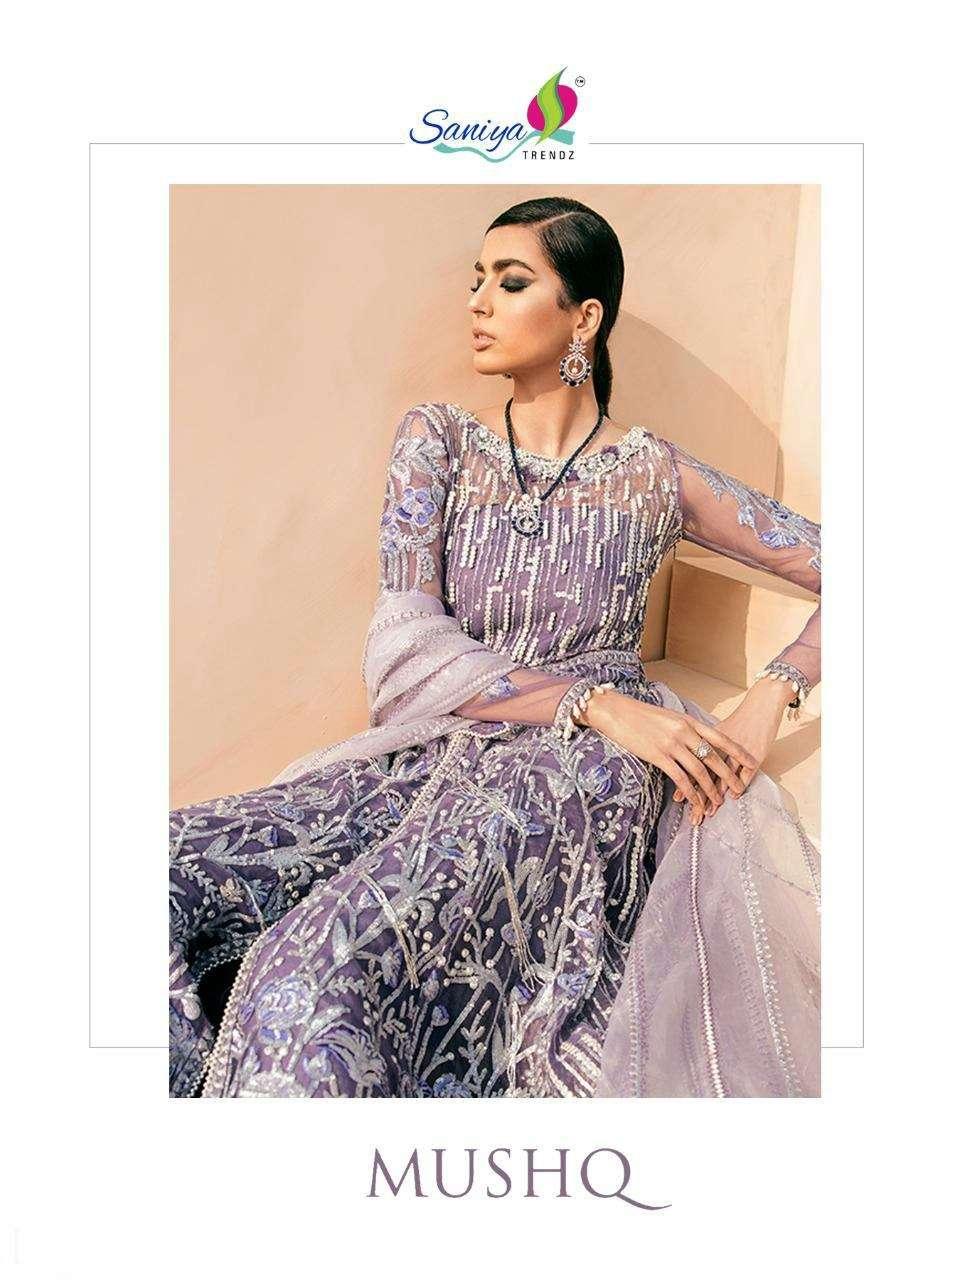 Saniya Trendz Mushq Butterfly Net With Heavy Embroidery Diamond Work Pakistani Suits collection